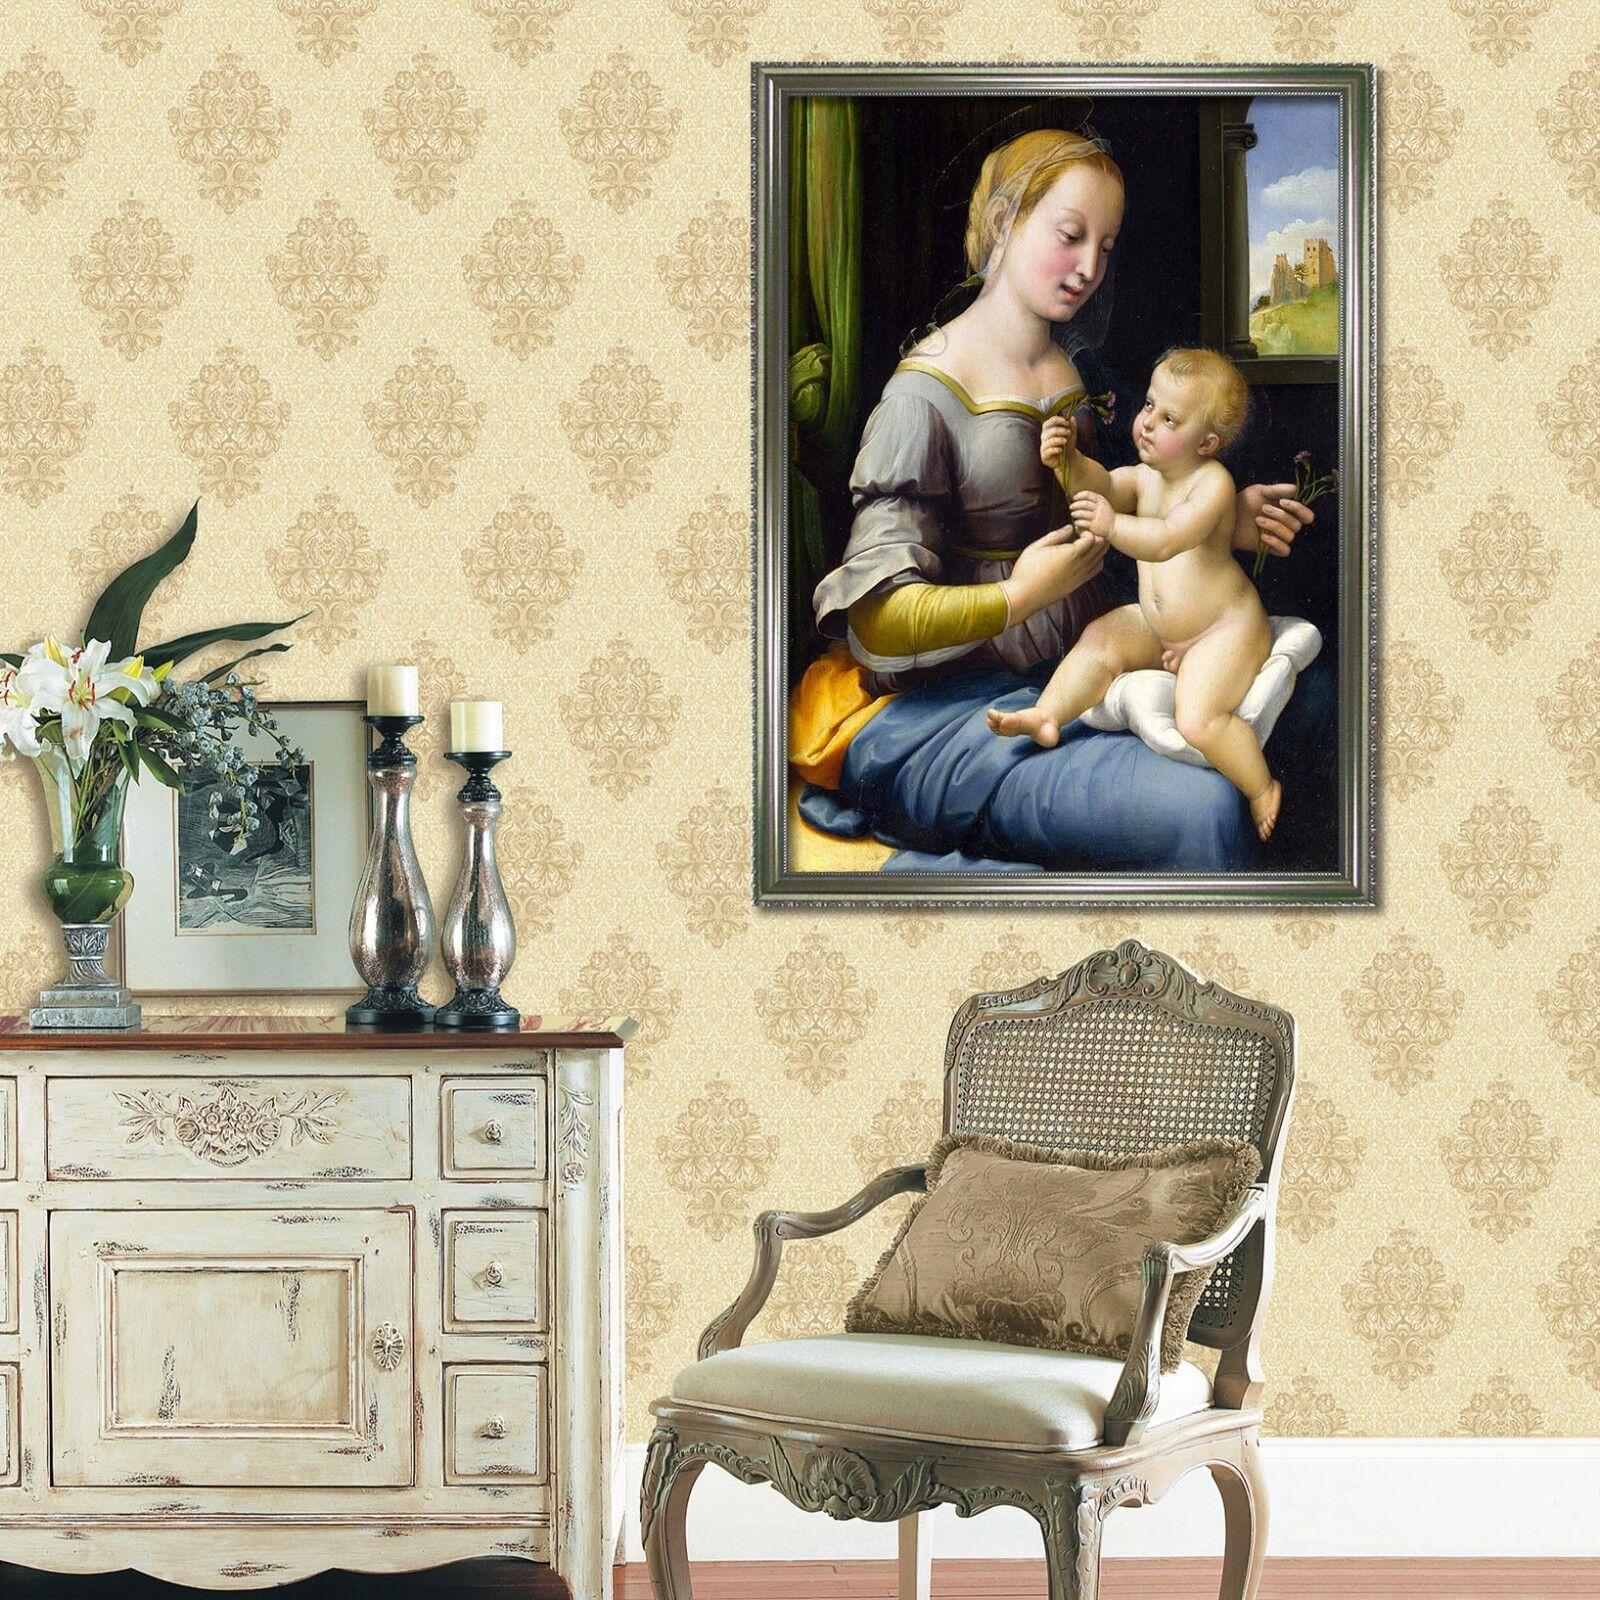 3D Calin Bébé 69 Framed Poster Home Decor imprimer peinture art AJ UK